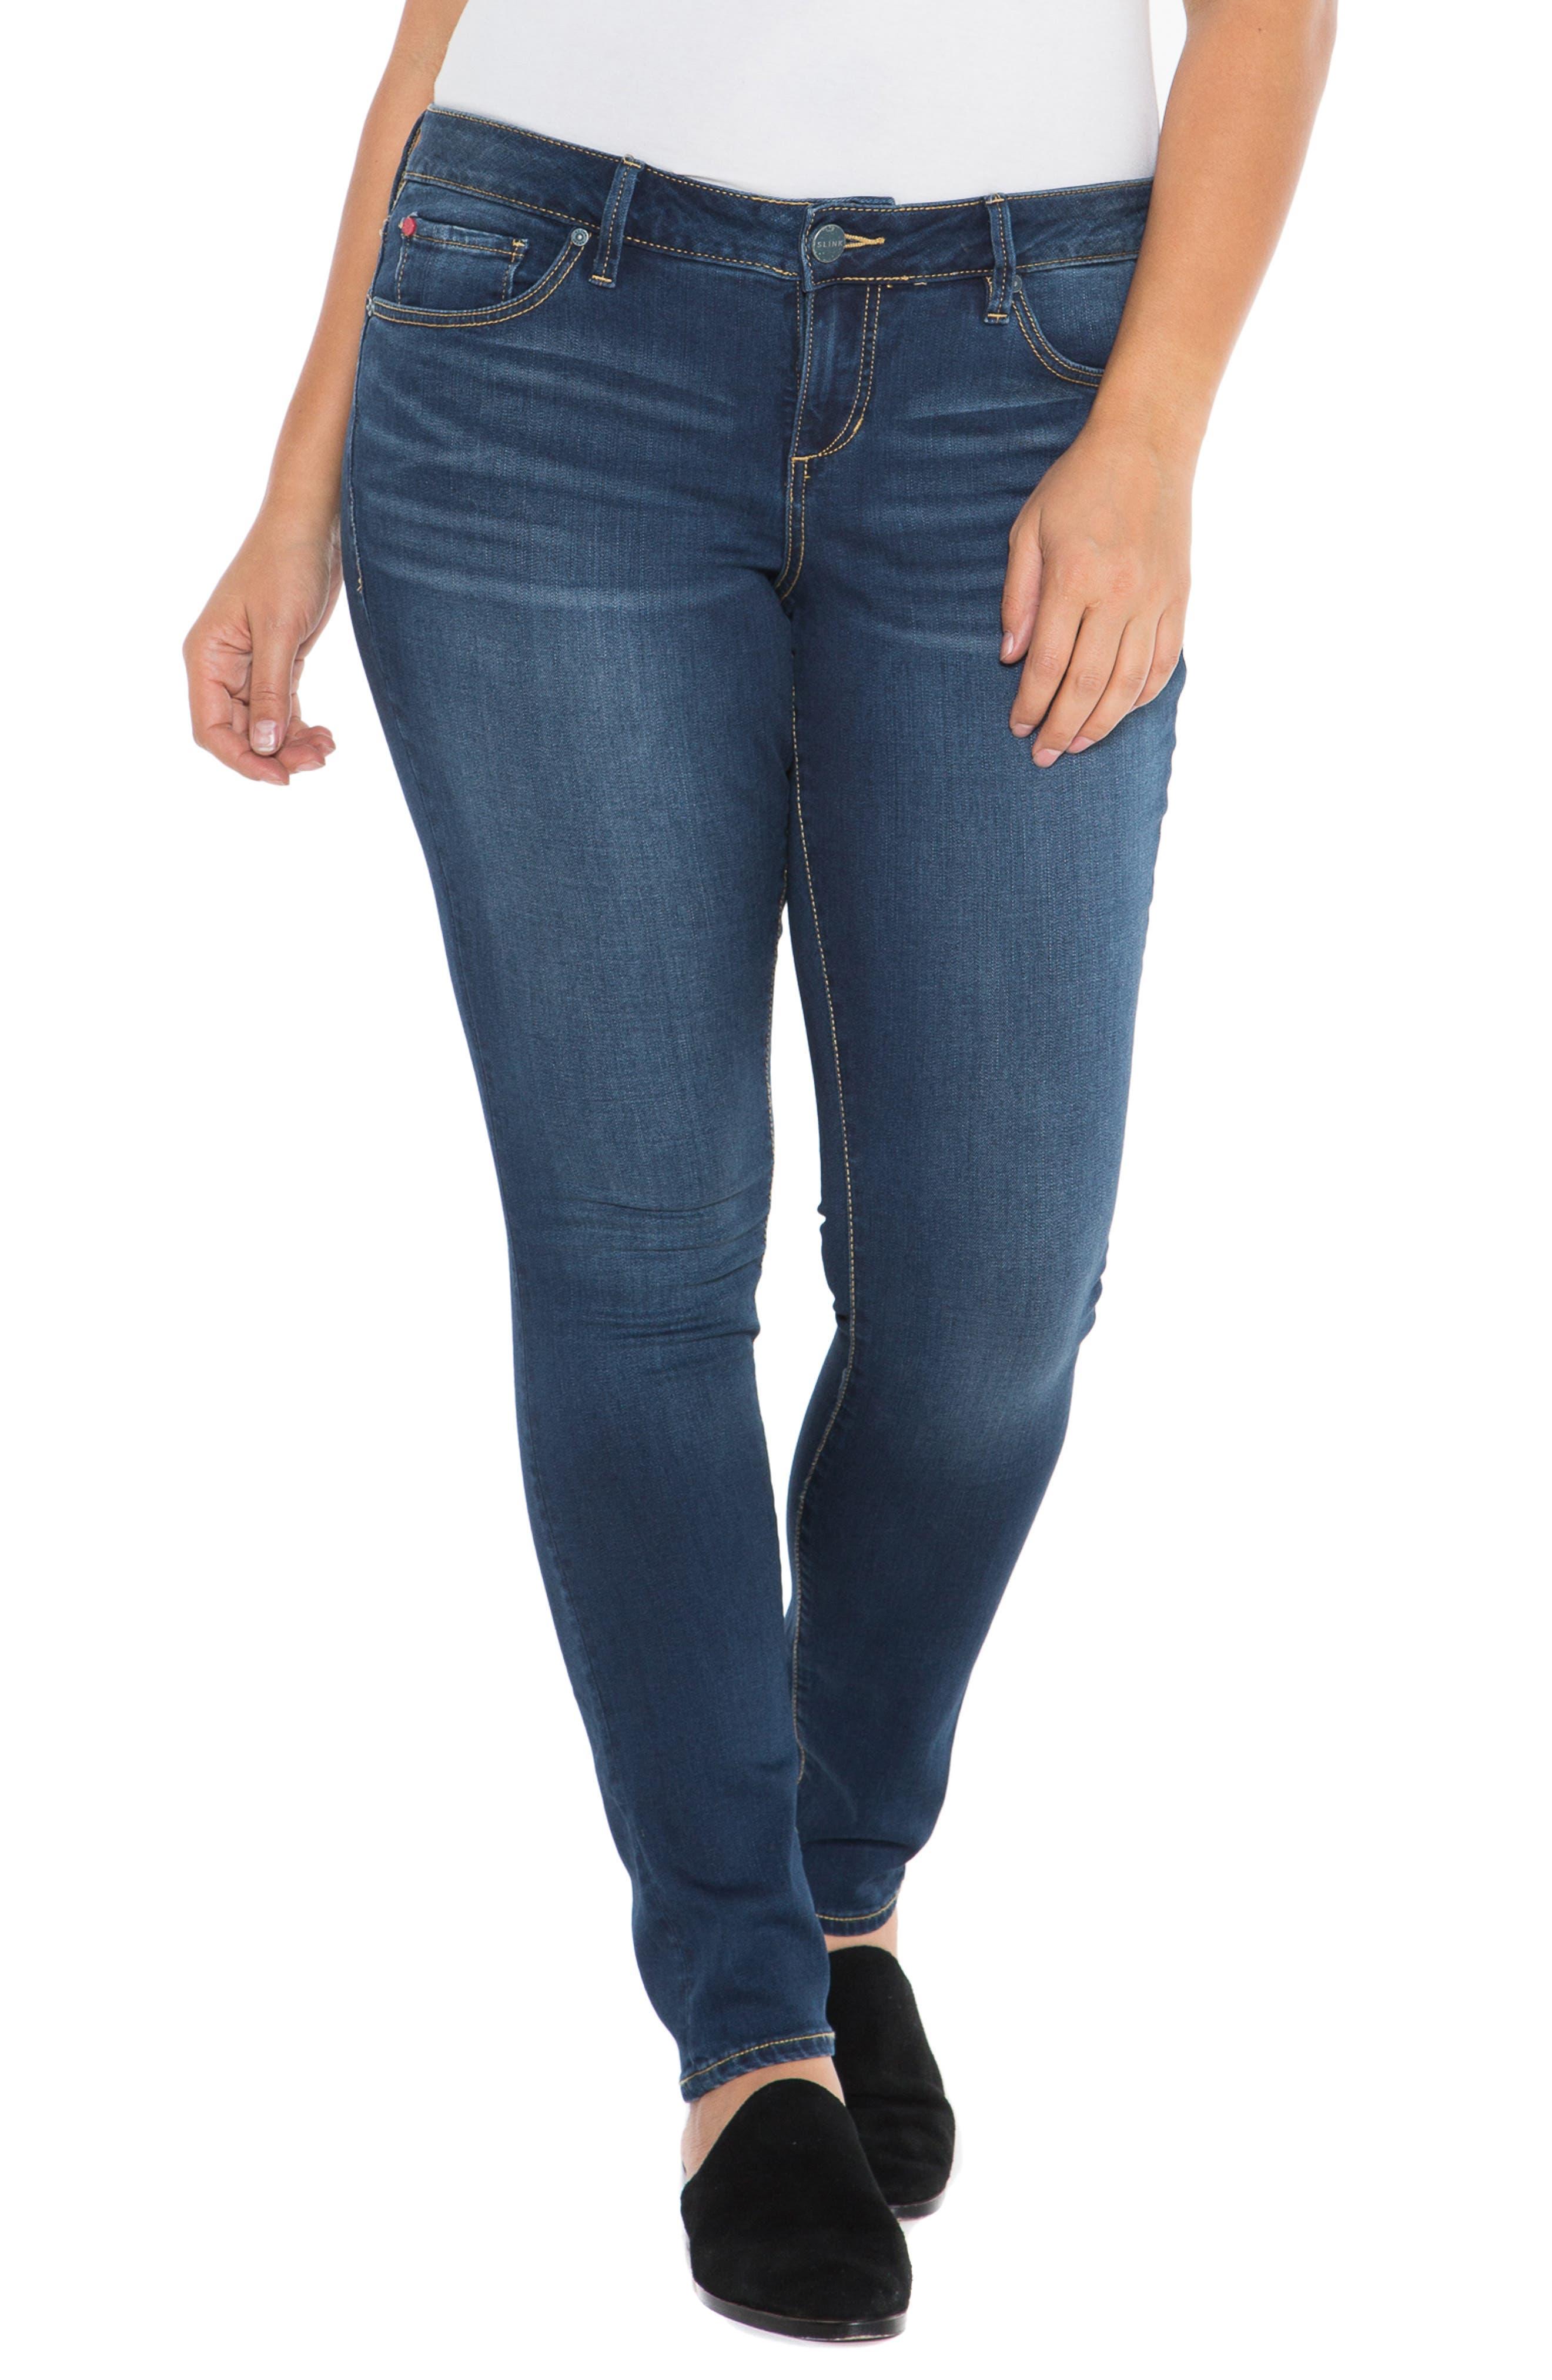 SLINK JEANS, 'The Skinny' Stretch Denim Jeans, Alternate thumbnail 6, color, AMBER